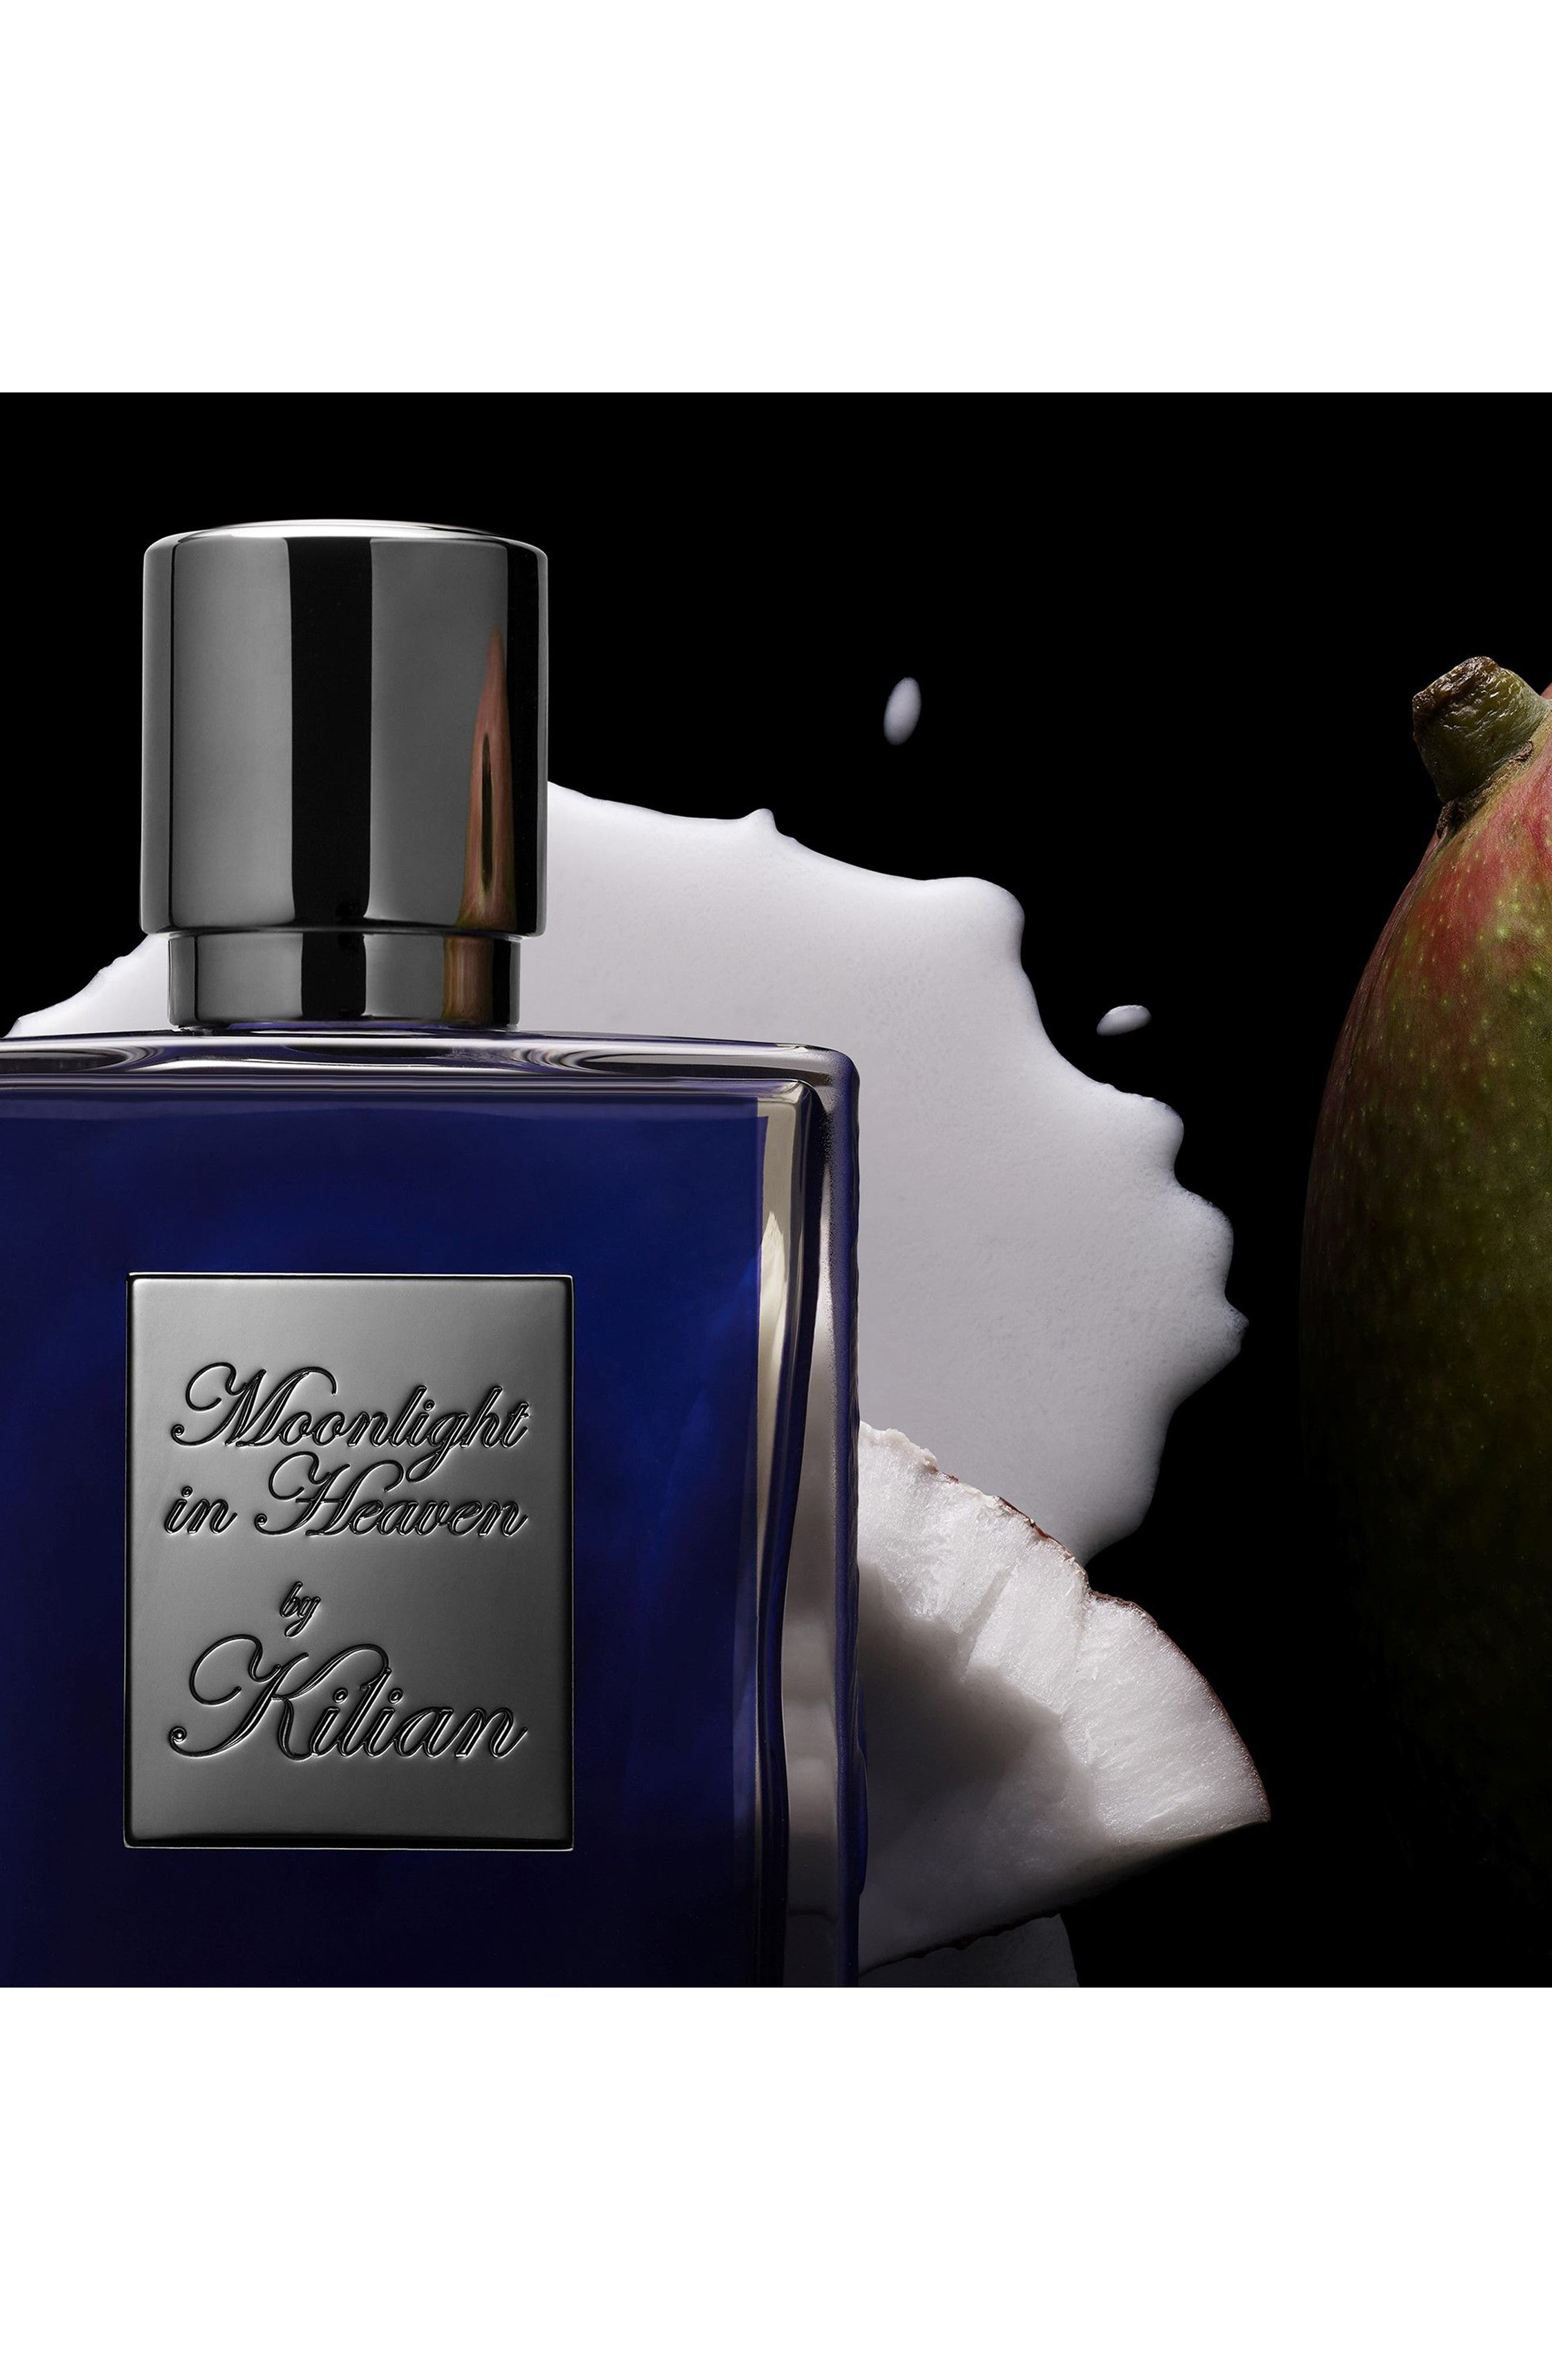 'An Escape - Moonlight in Heaven' Refillable Fragrance,                             Alternate thumbnail 8, color,                             NO COLOR